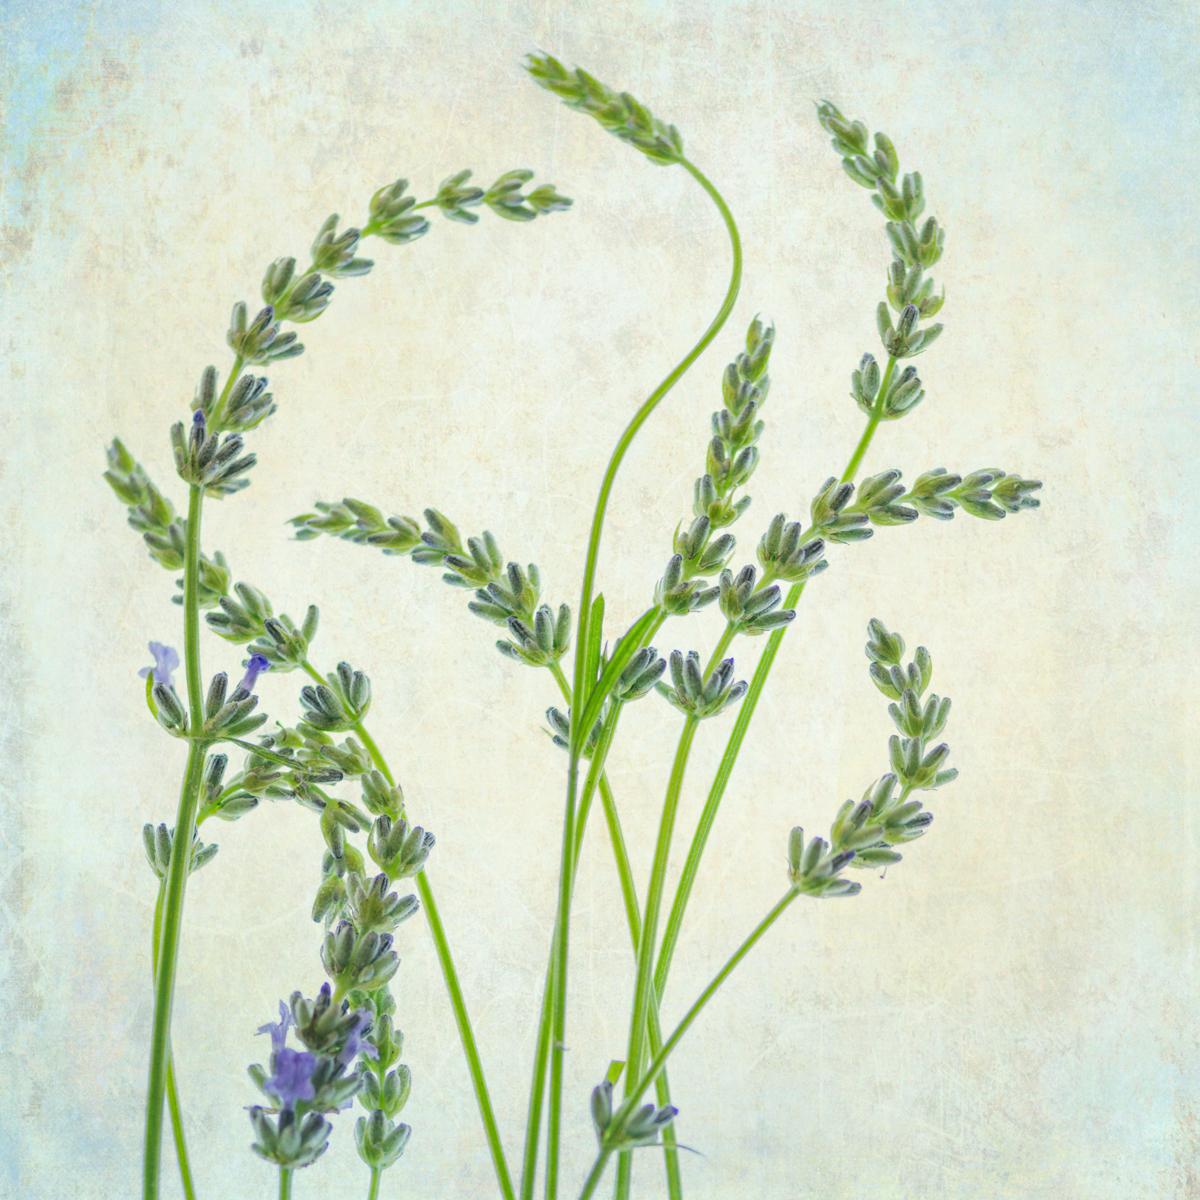 Lavender I (large view)